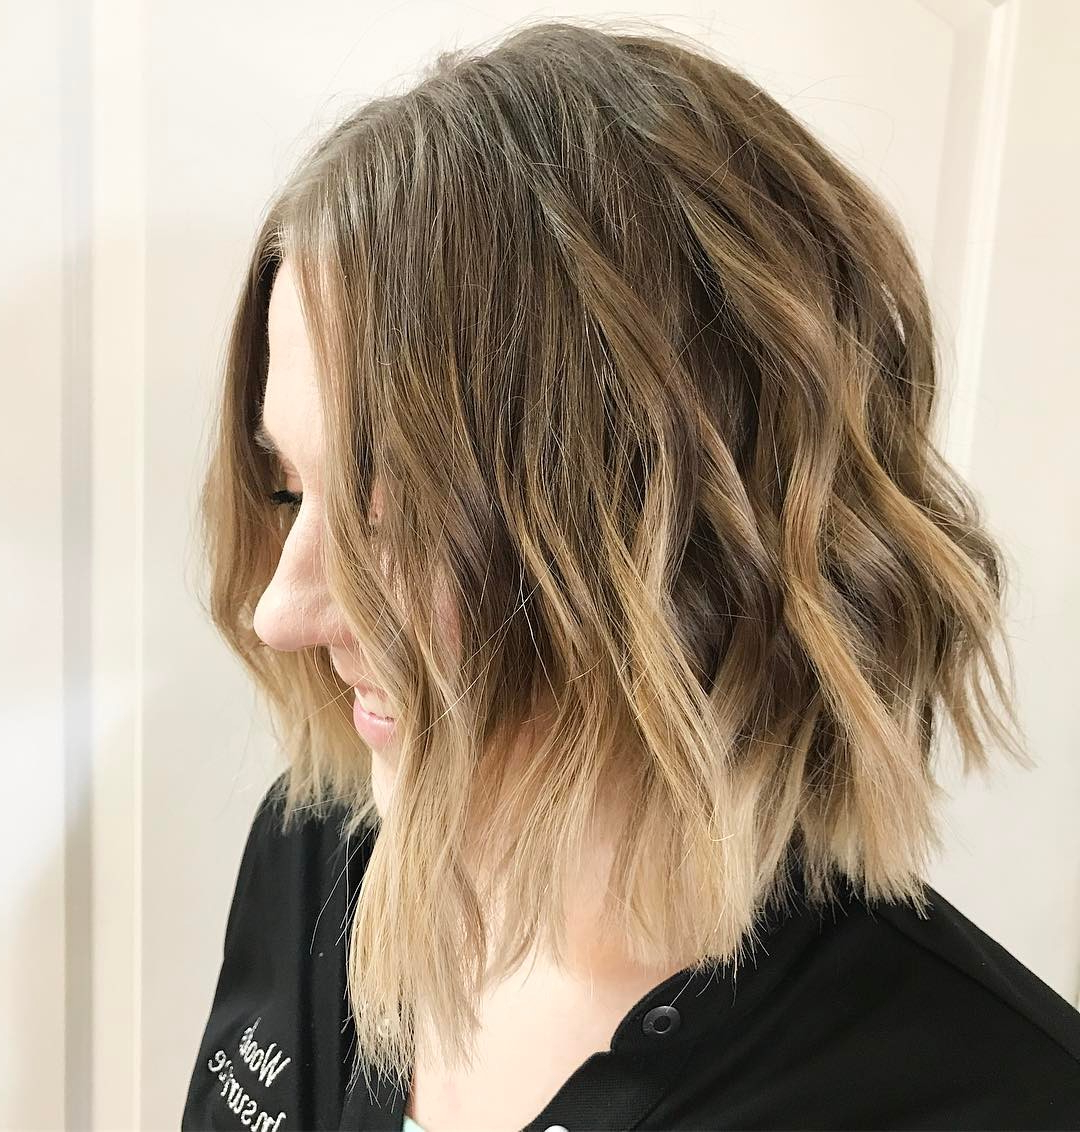 10 Beautiful Medium Bob Haircuts &edgy Looks: Shoulder Regarding Most Popular Wavy Bob Hairstyles With Twists (Gallery 17 of 20)